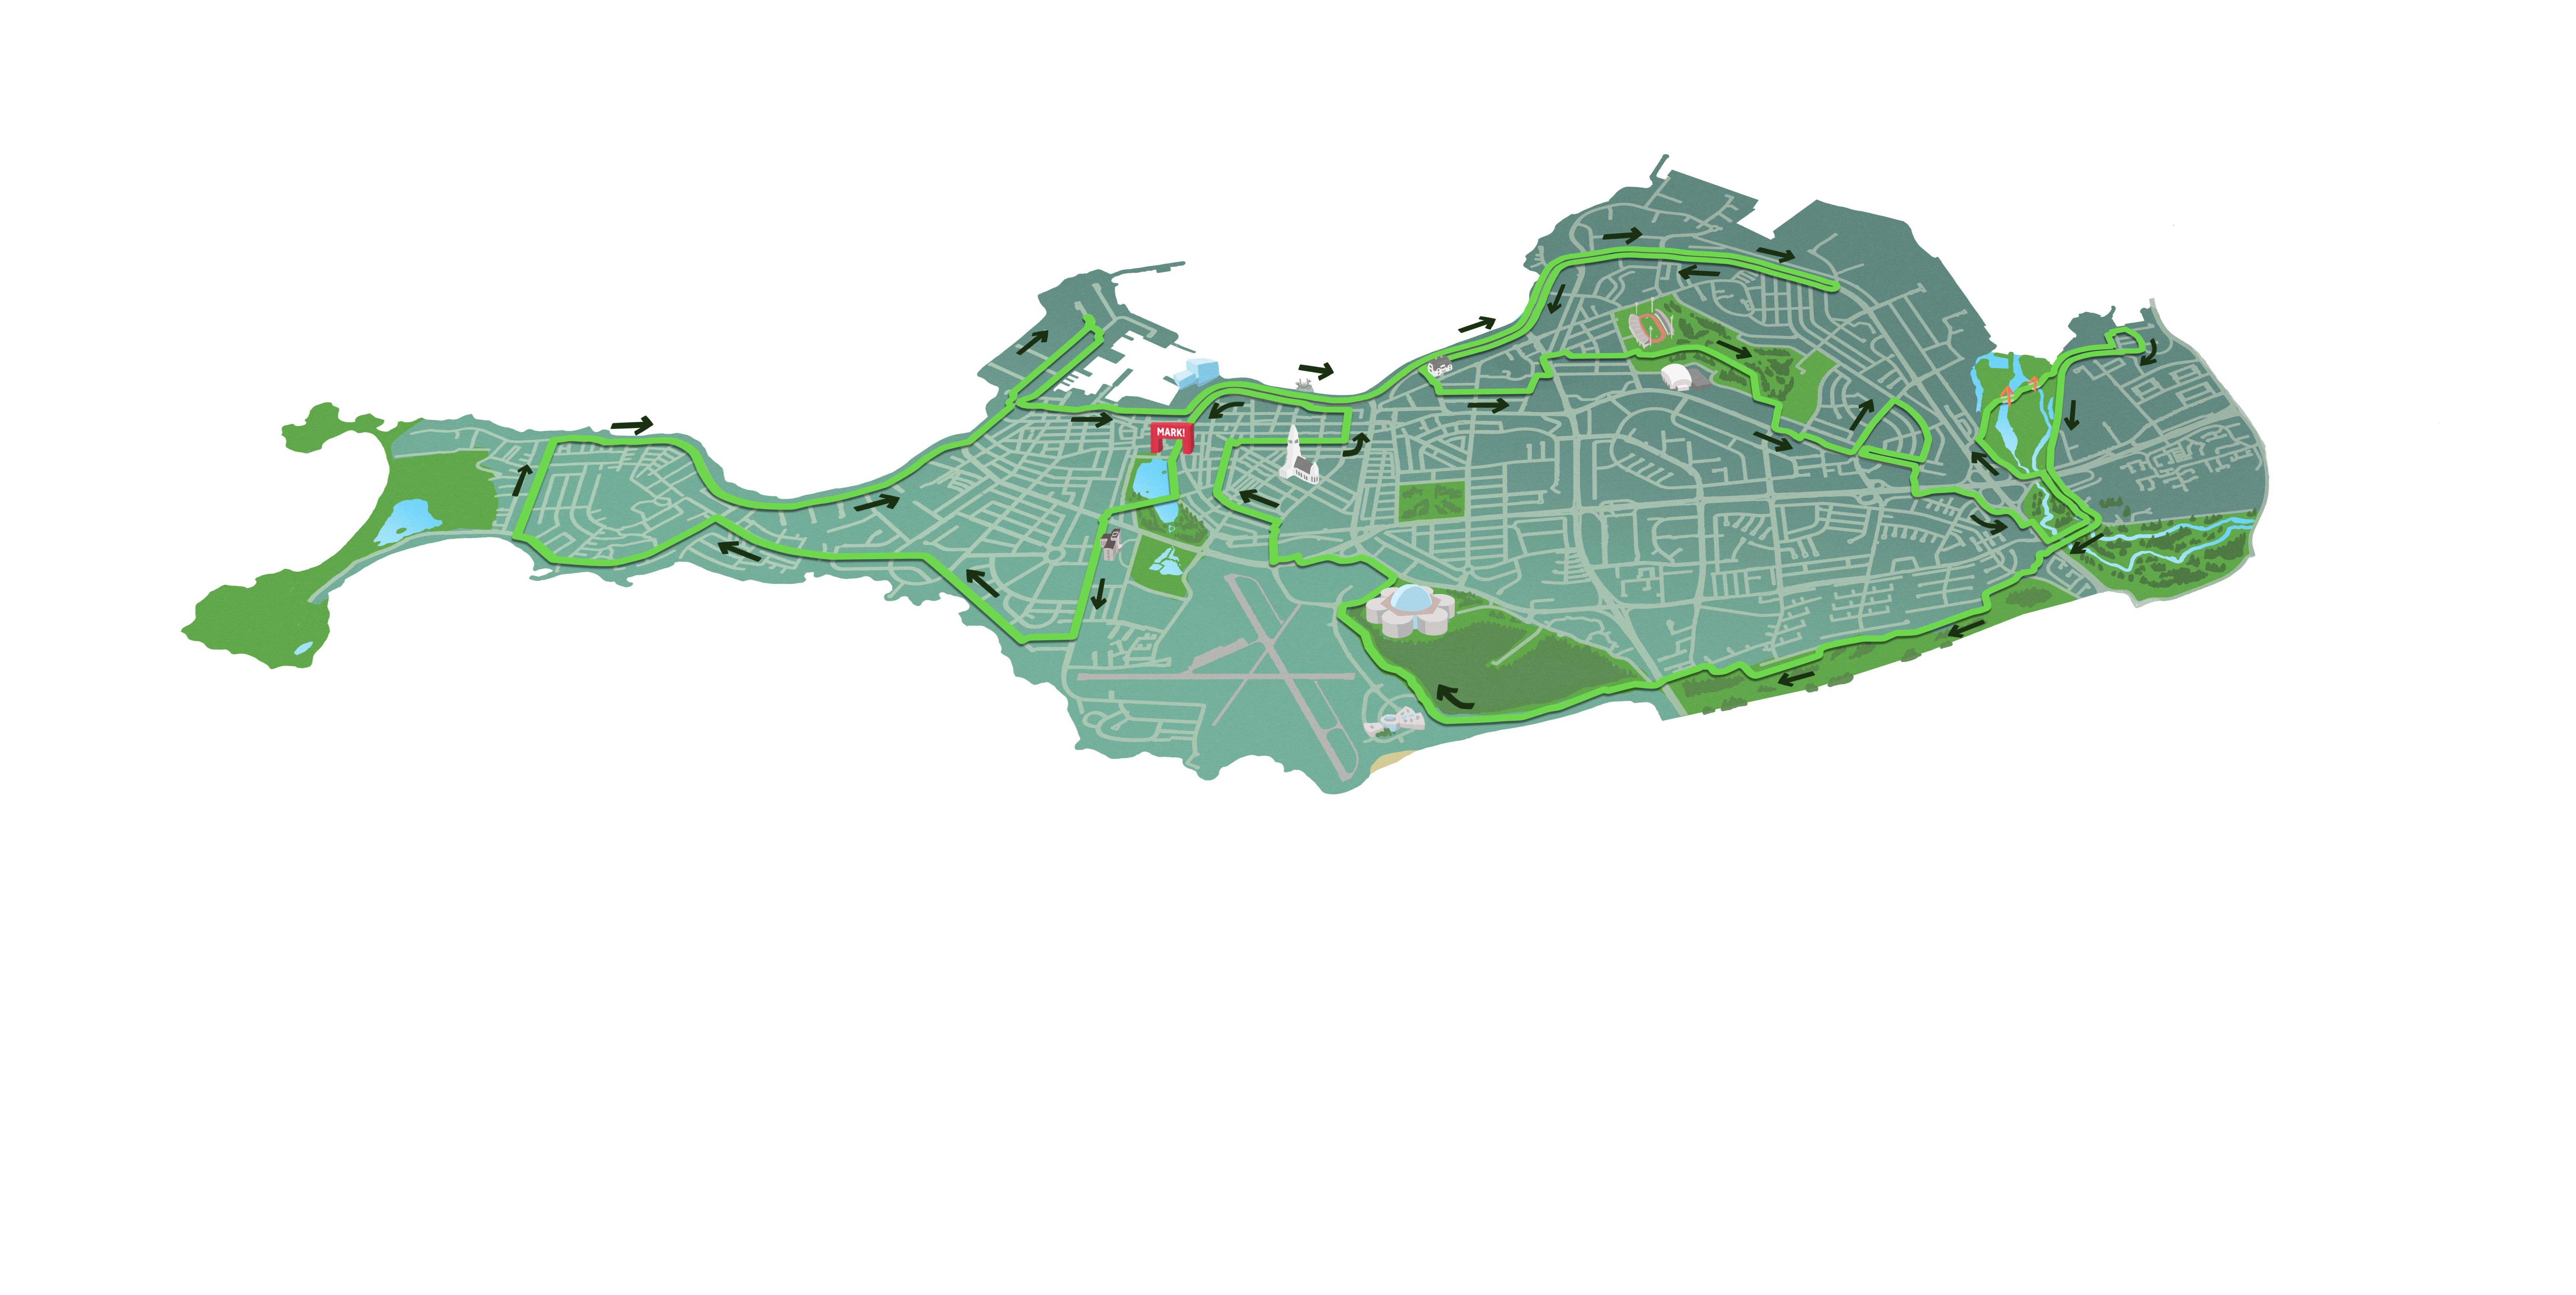 Map of the marathon distance